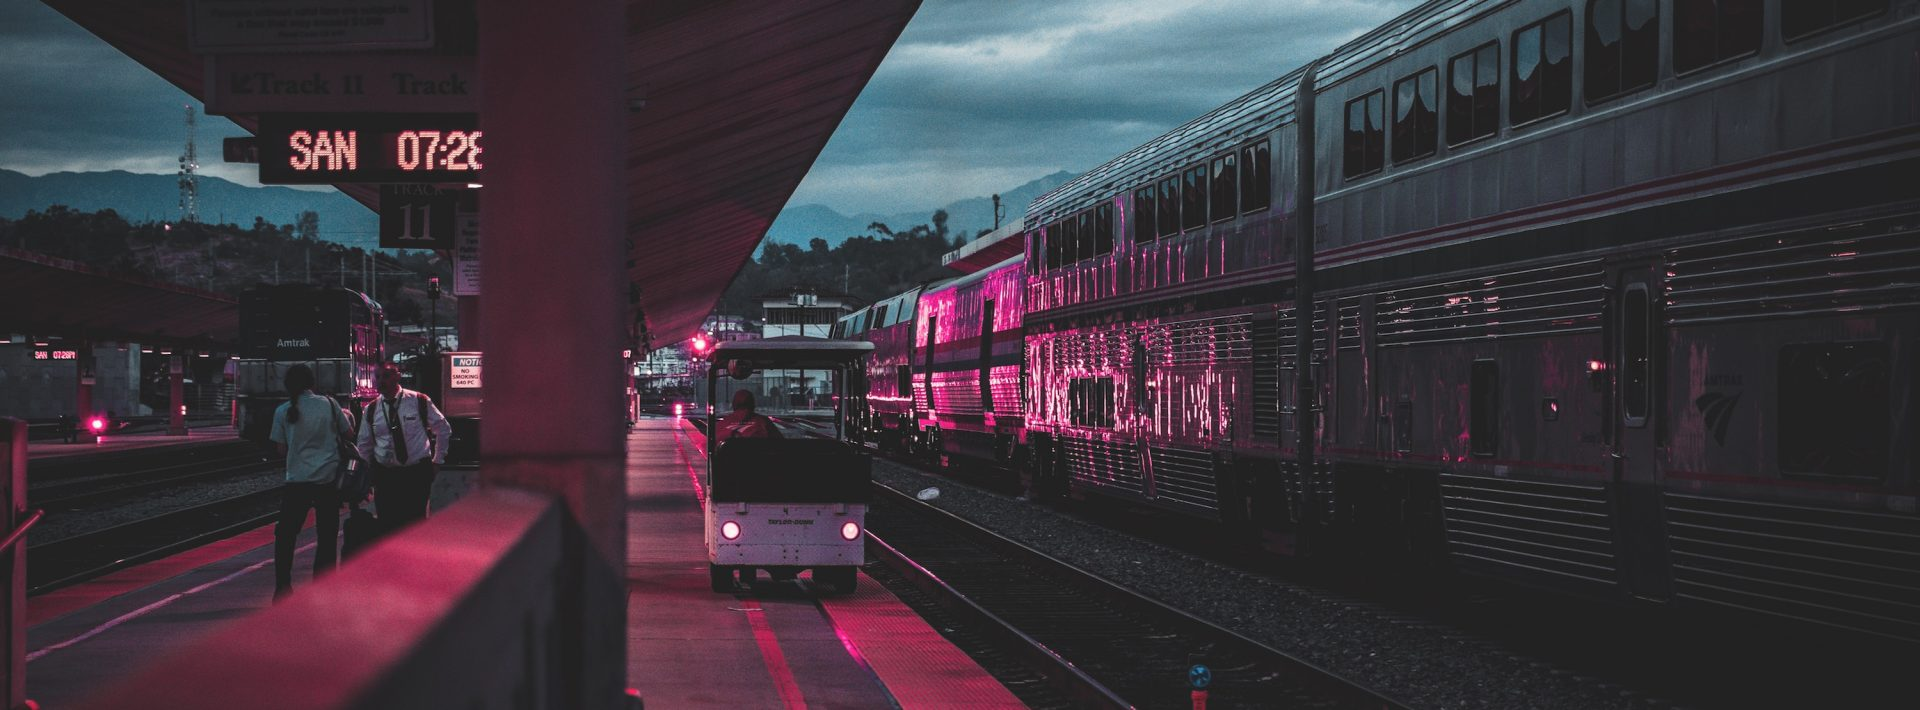 la train station